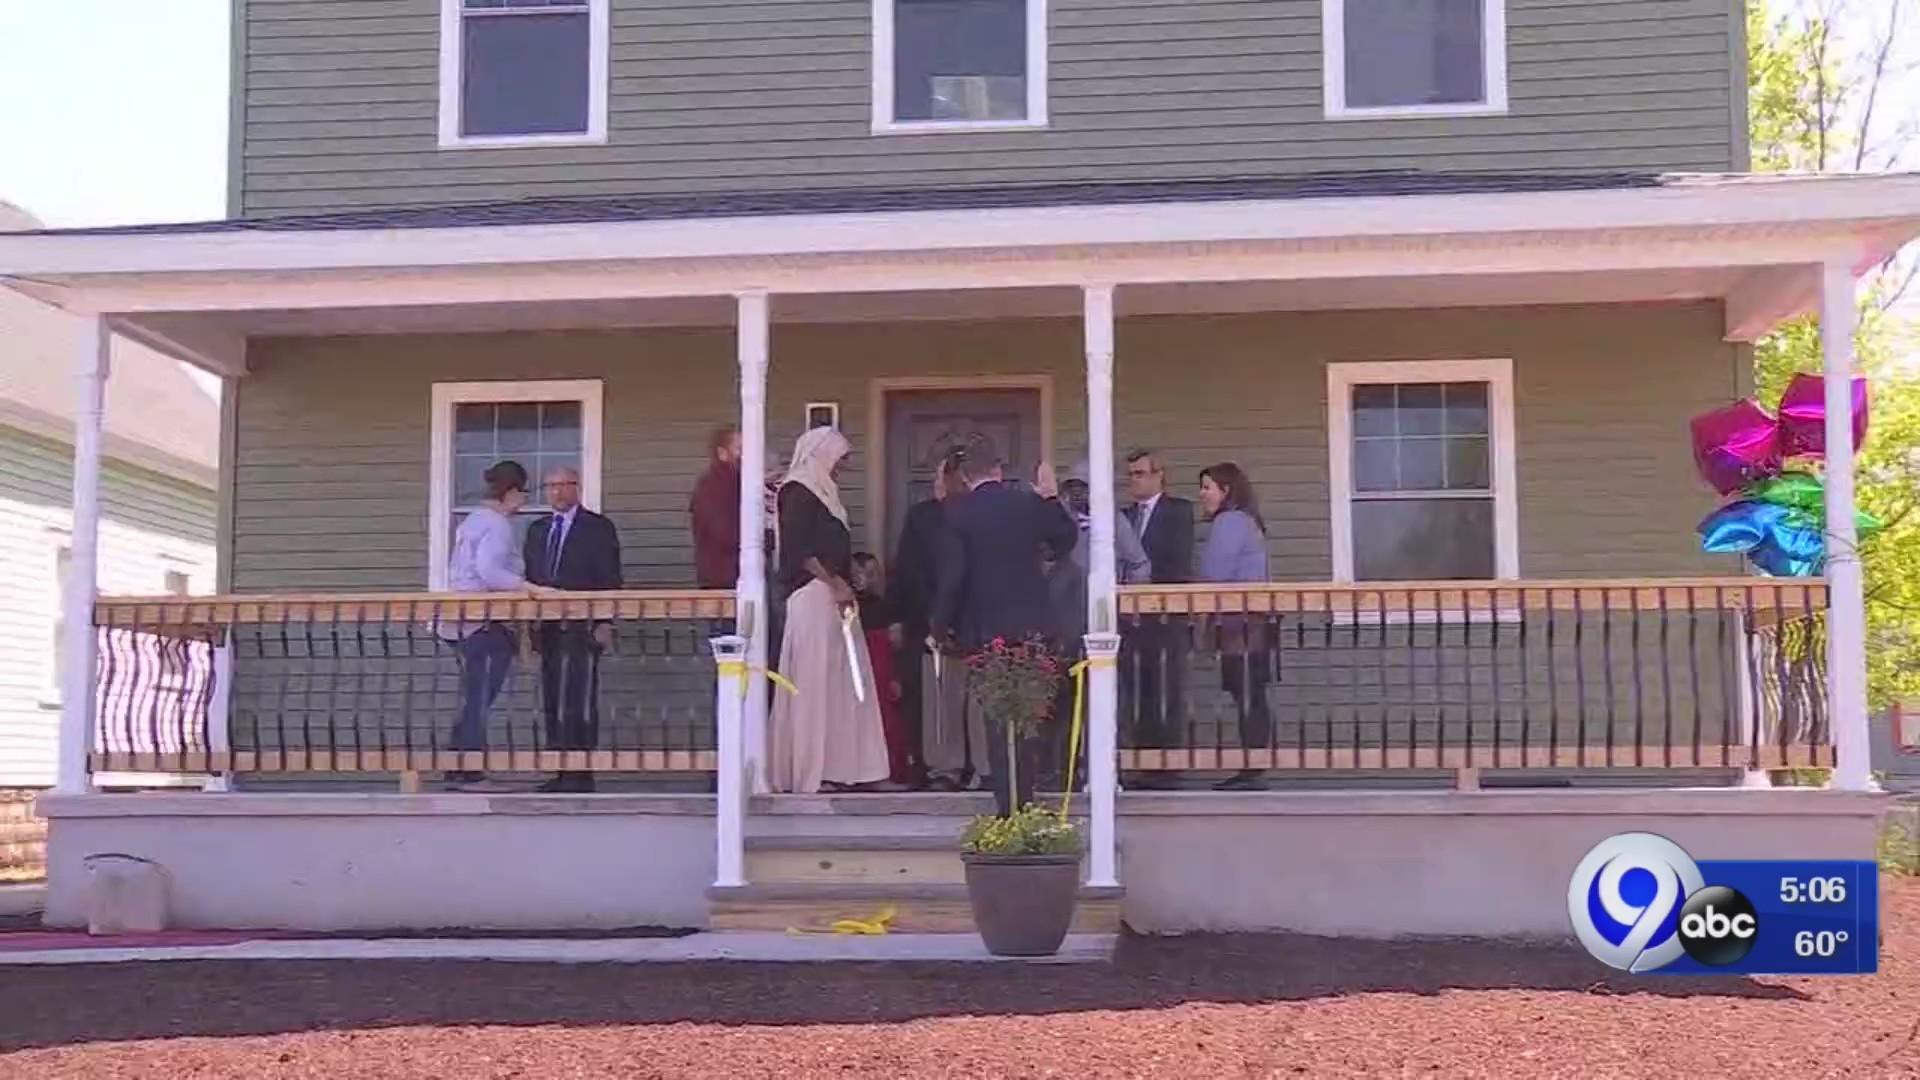 New_home_built_on_Syracuse___s_north_sid_0_20190508211420